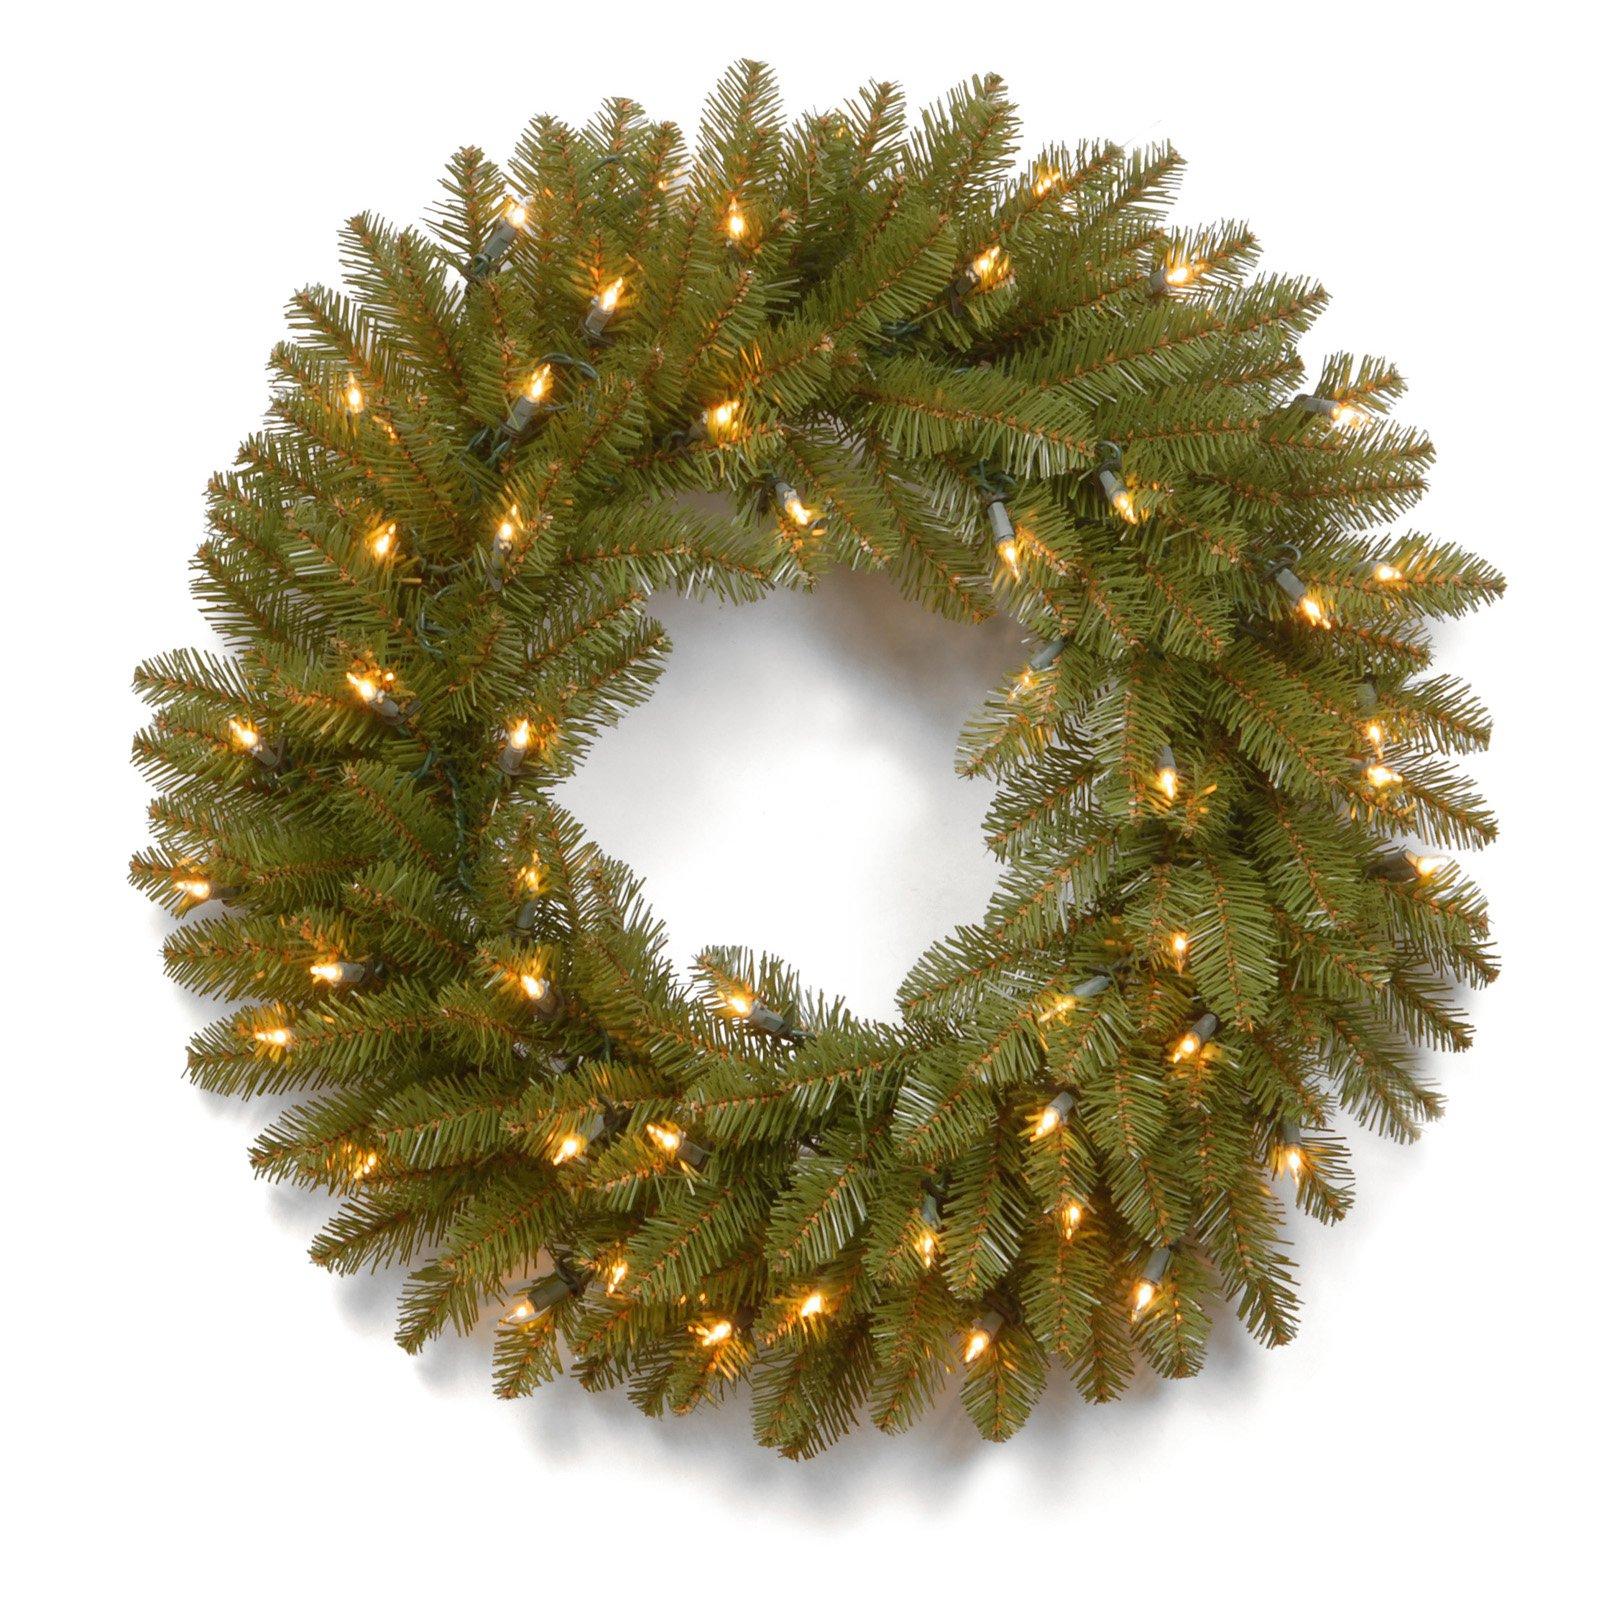 24 in. Dunhill Fir Pre-Lit Christmas Wreath